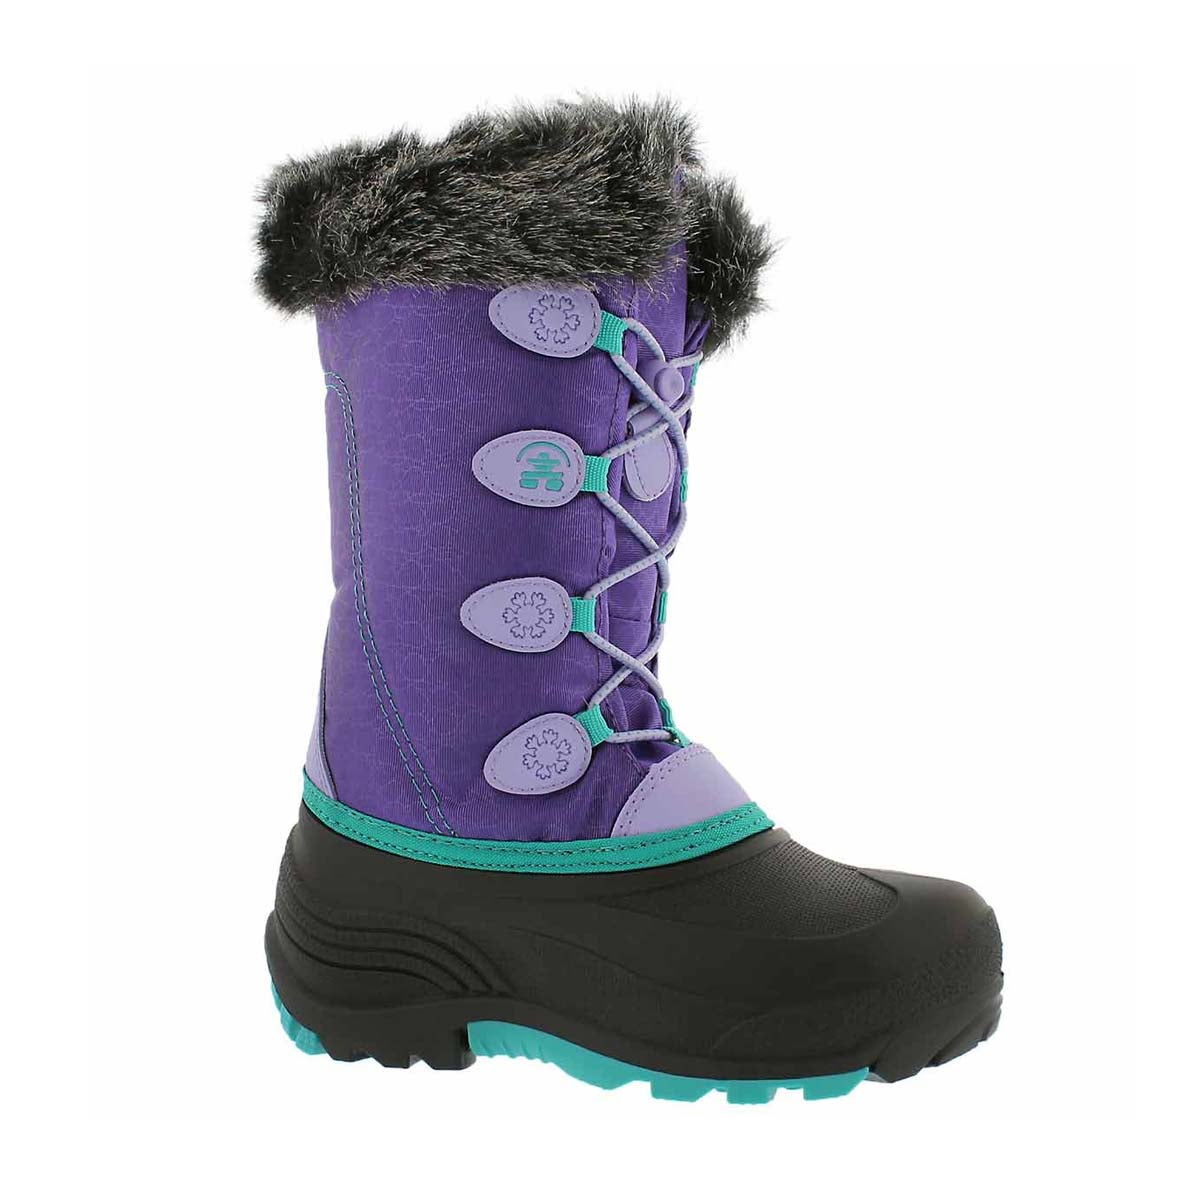 Girls' SNOWGYPSY purple winter boots